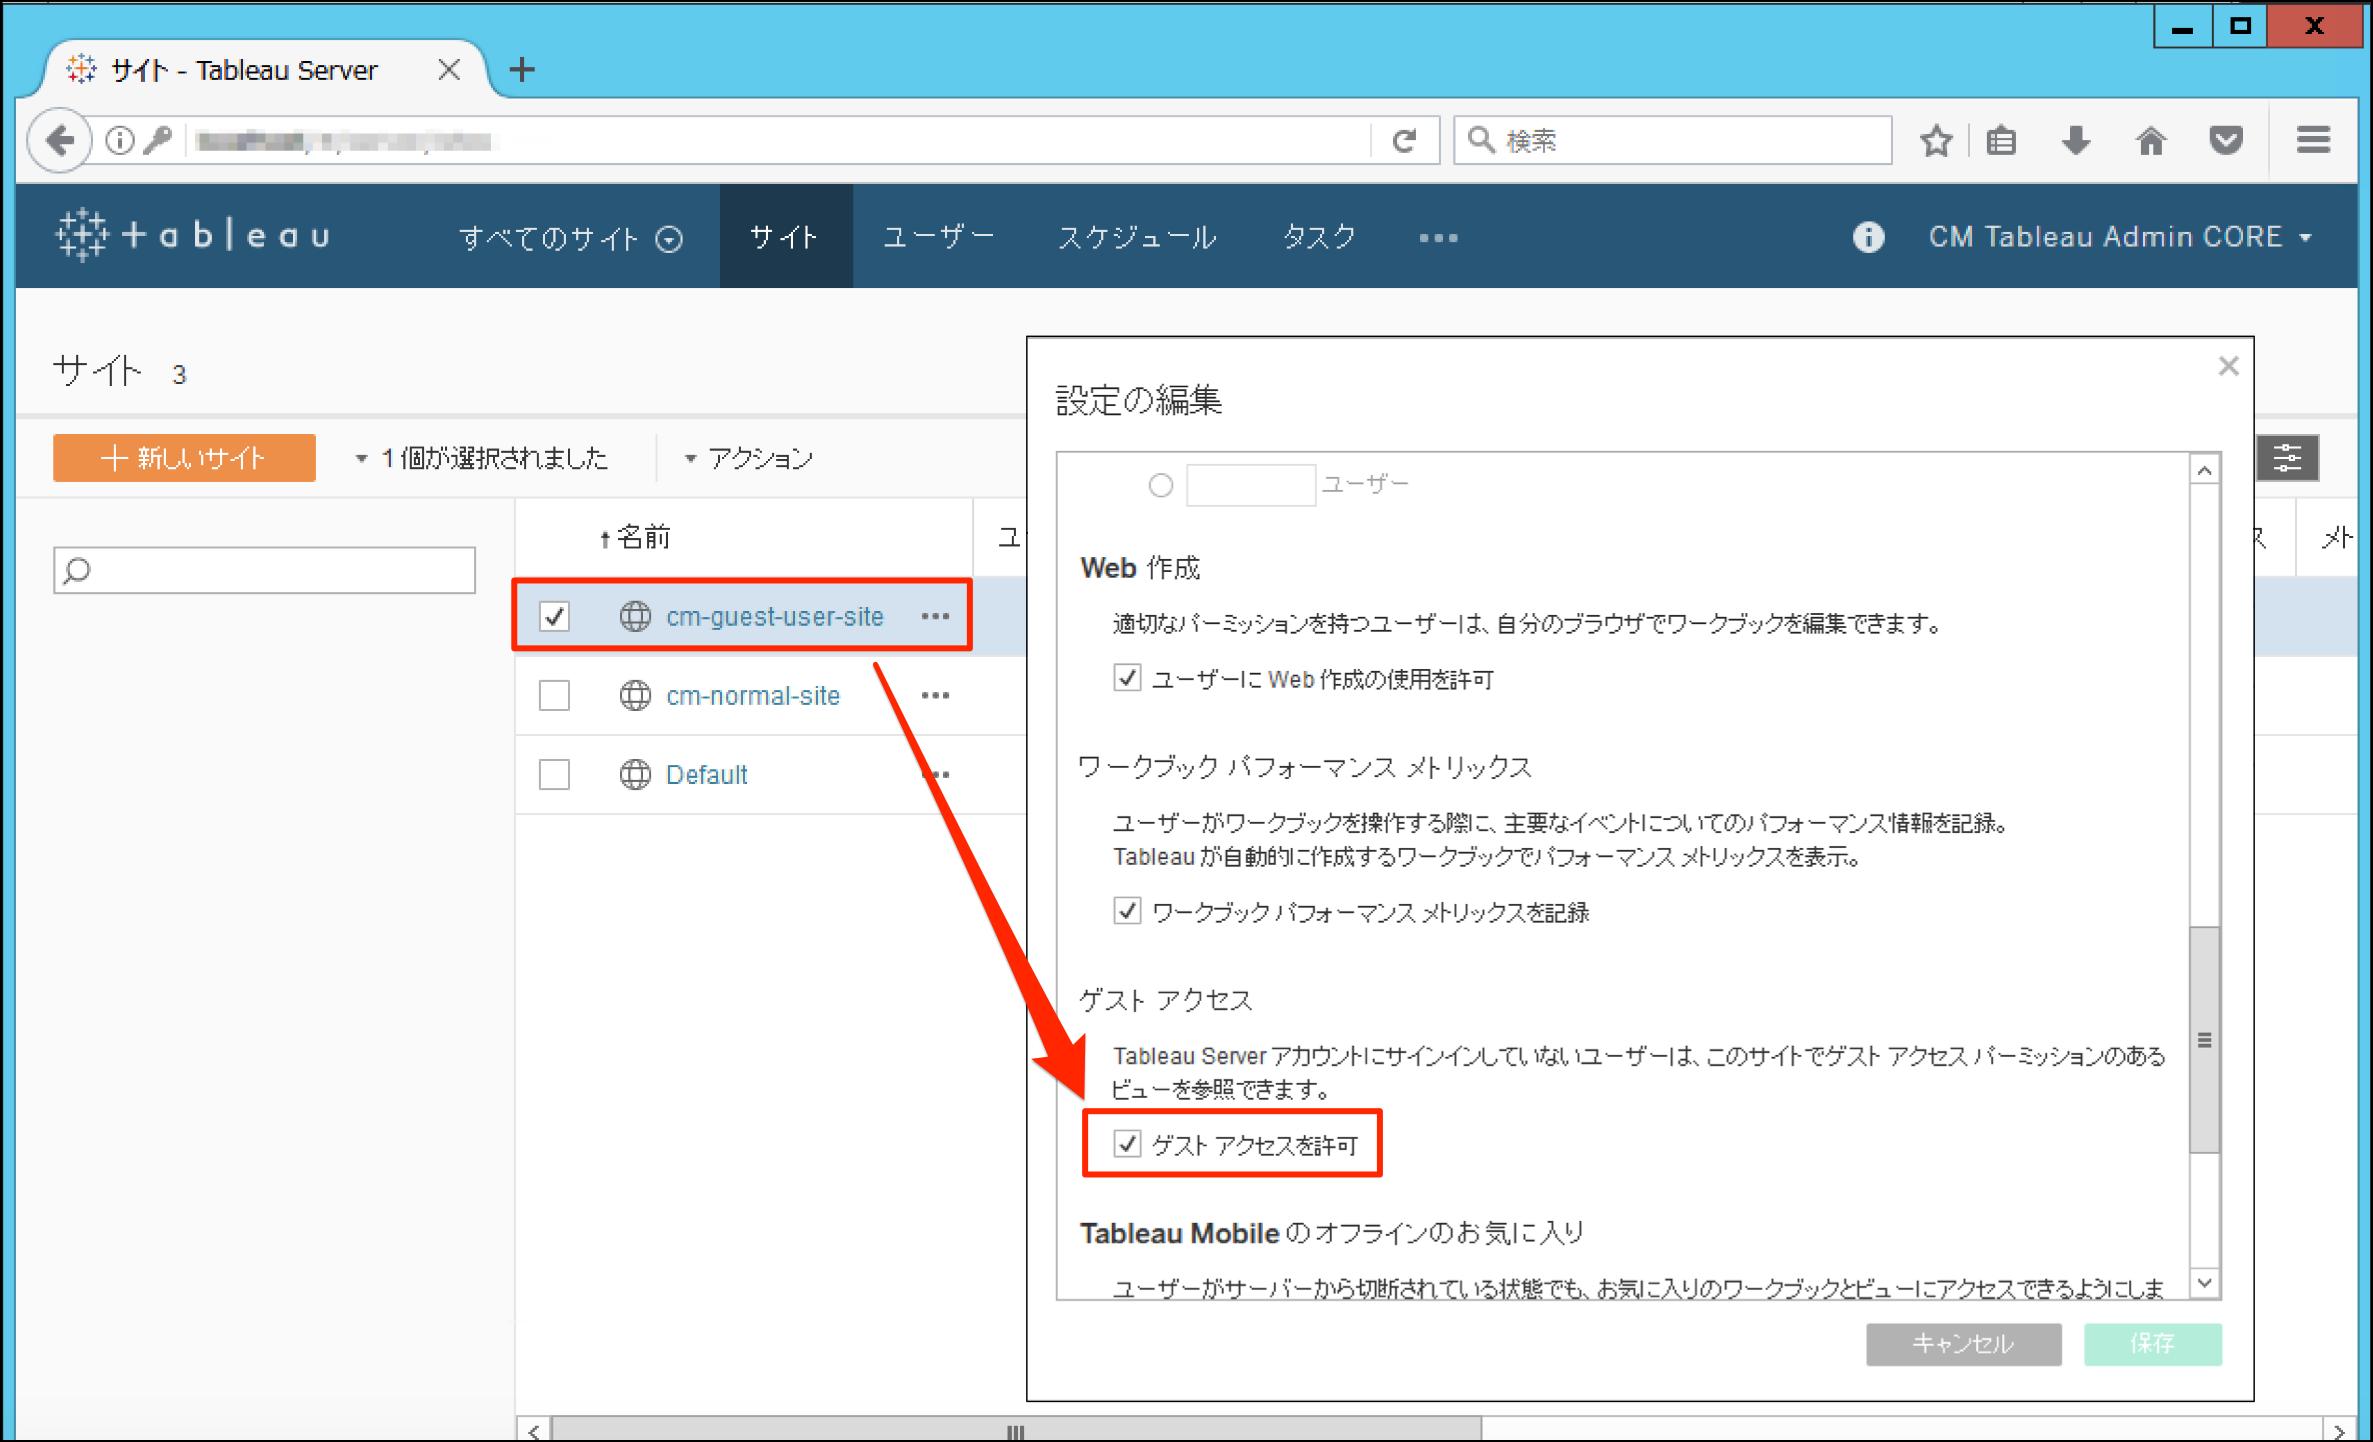 tableau-server-core-lisence-guest-user-option_09